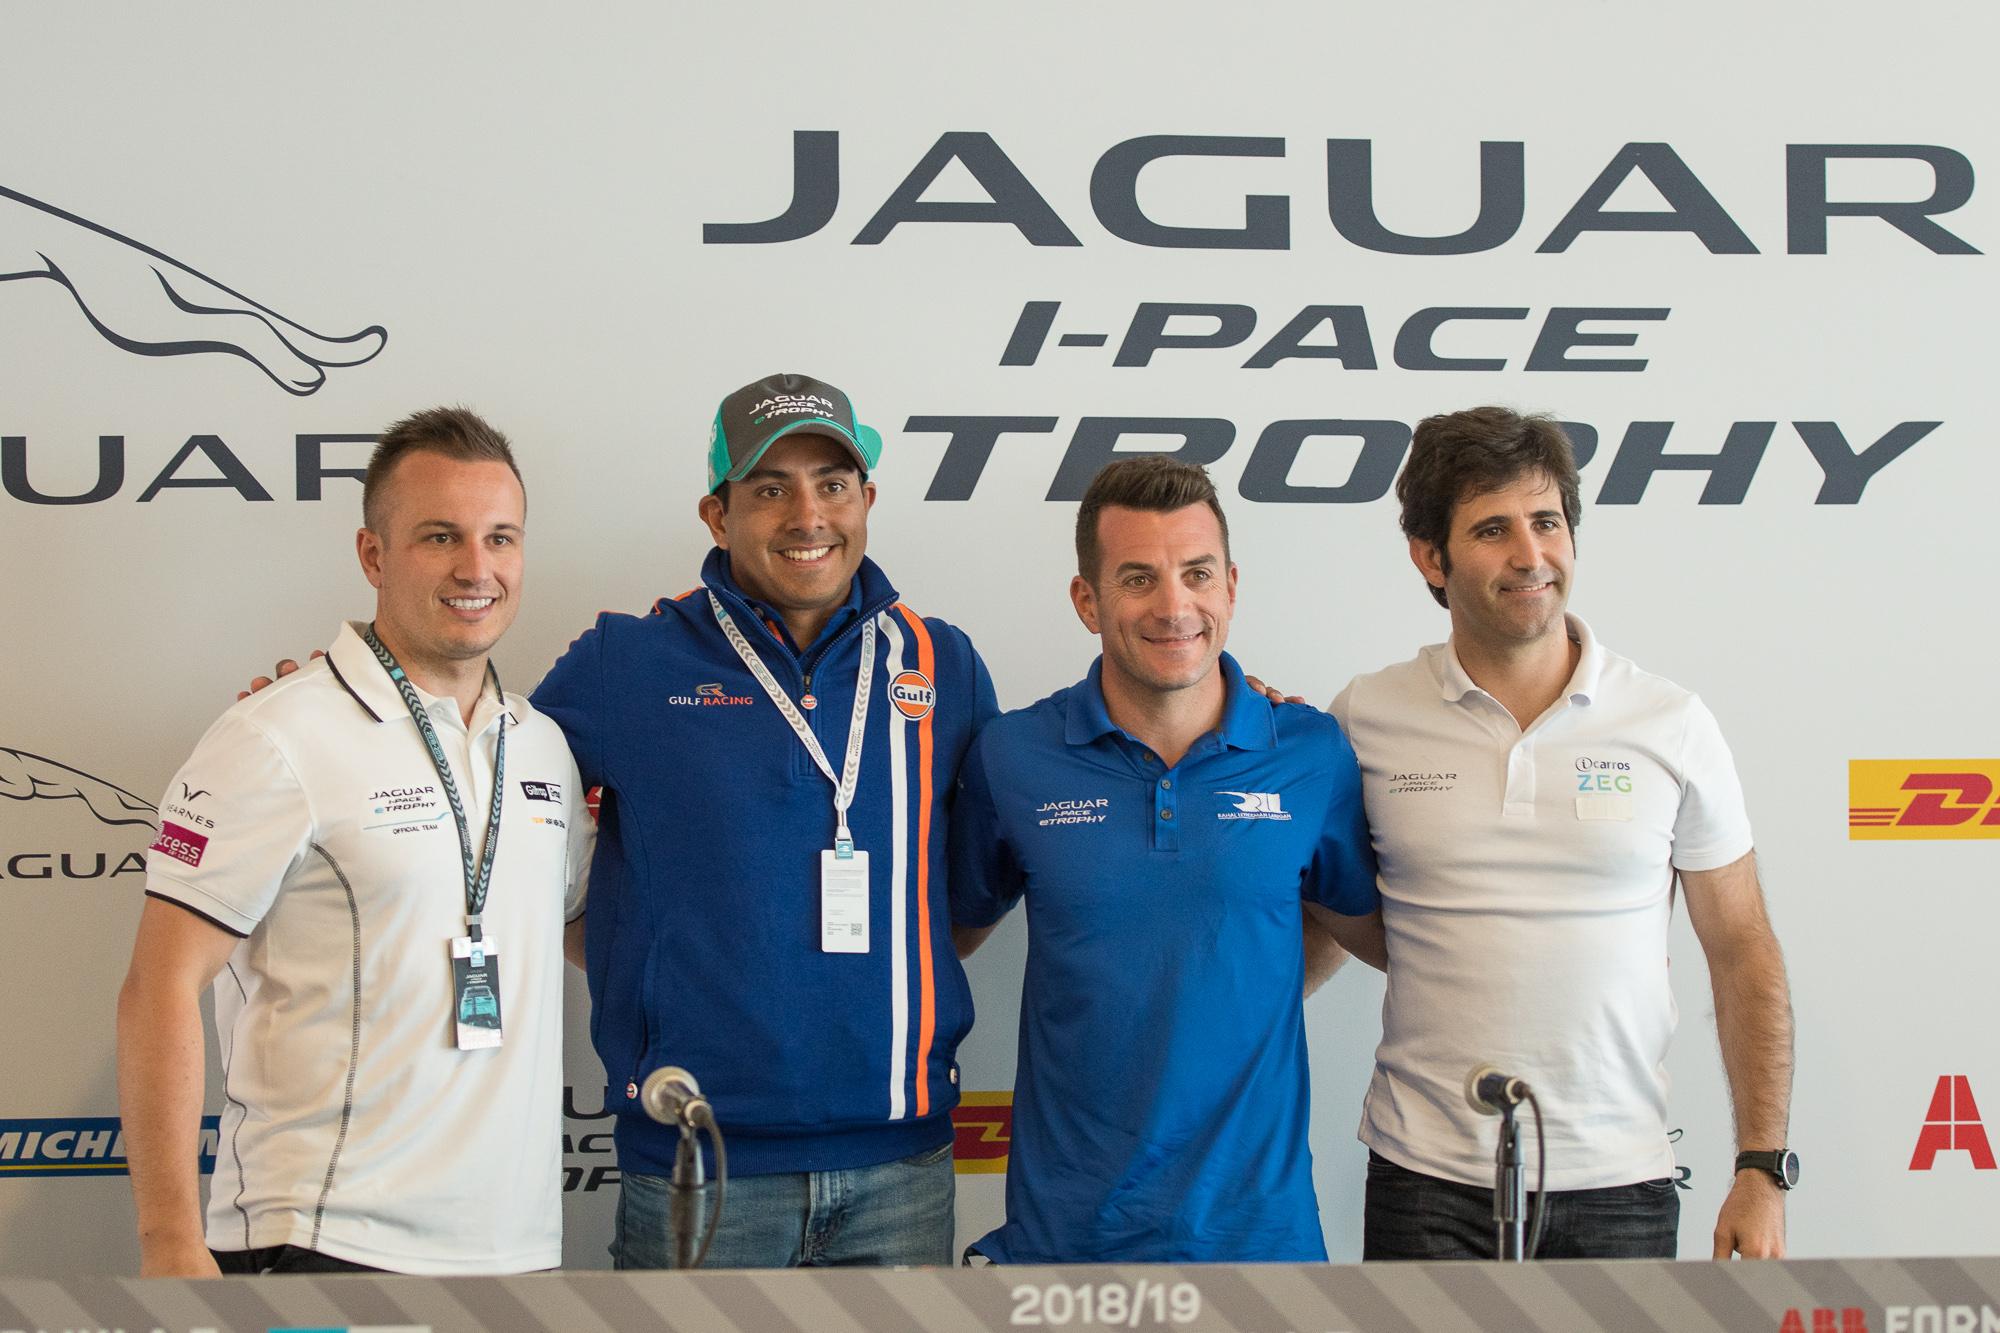 JaguarBR_4.Mexico_josemariodias_04008